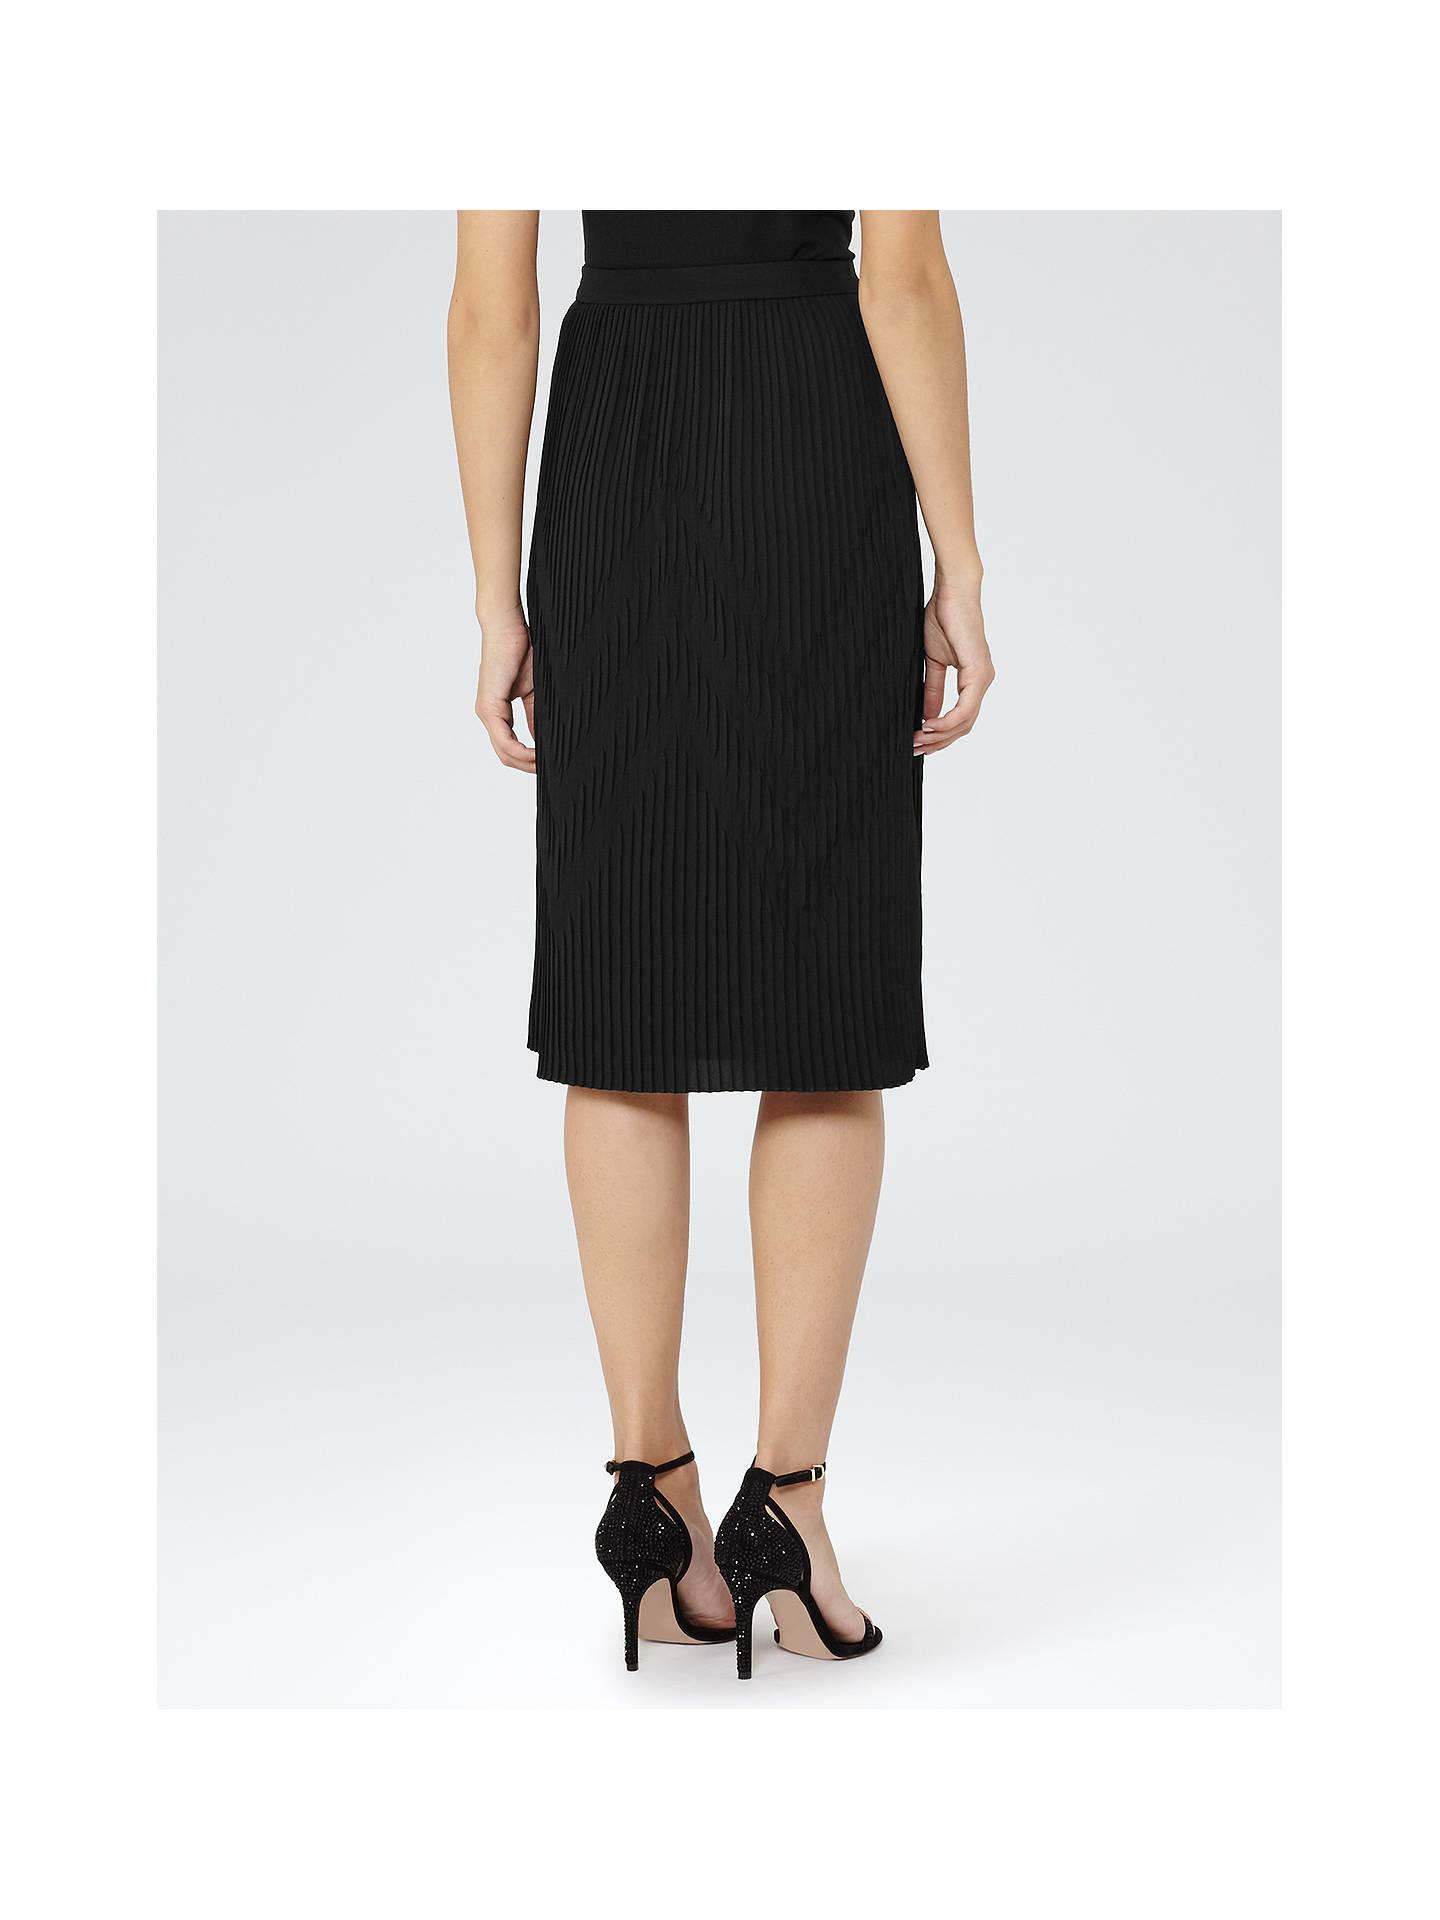 4b879536e ... Buy Reiss Trudy Plisse Midi Skirt, Black, 6 Online at johnlewis.com ...